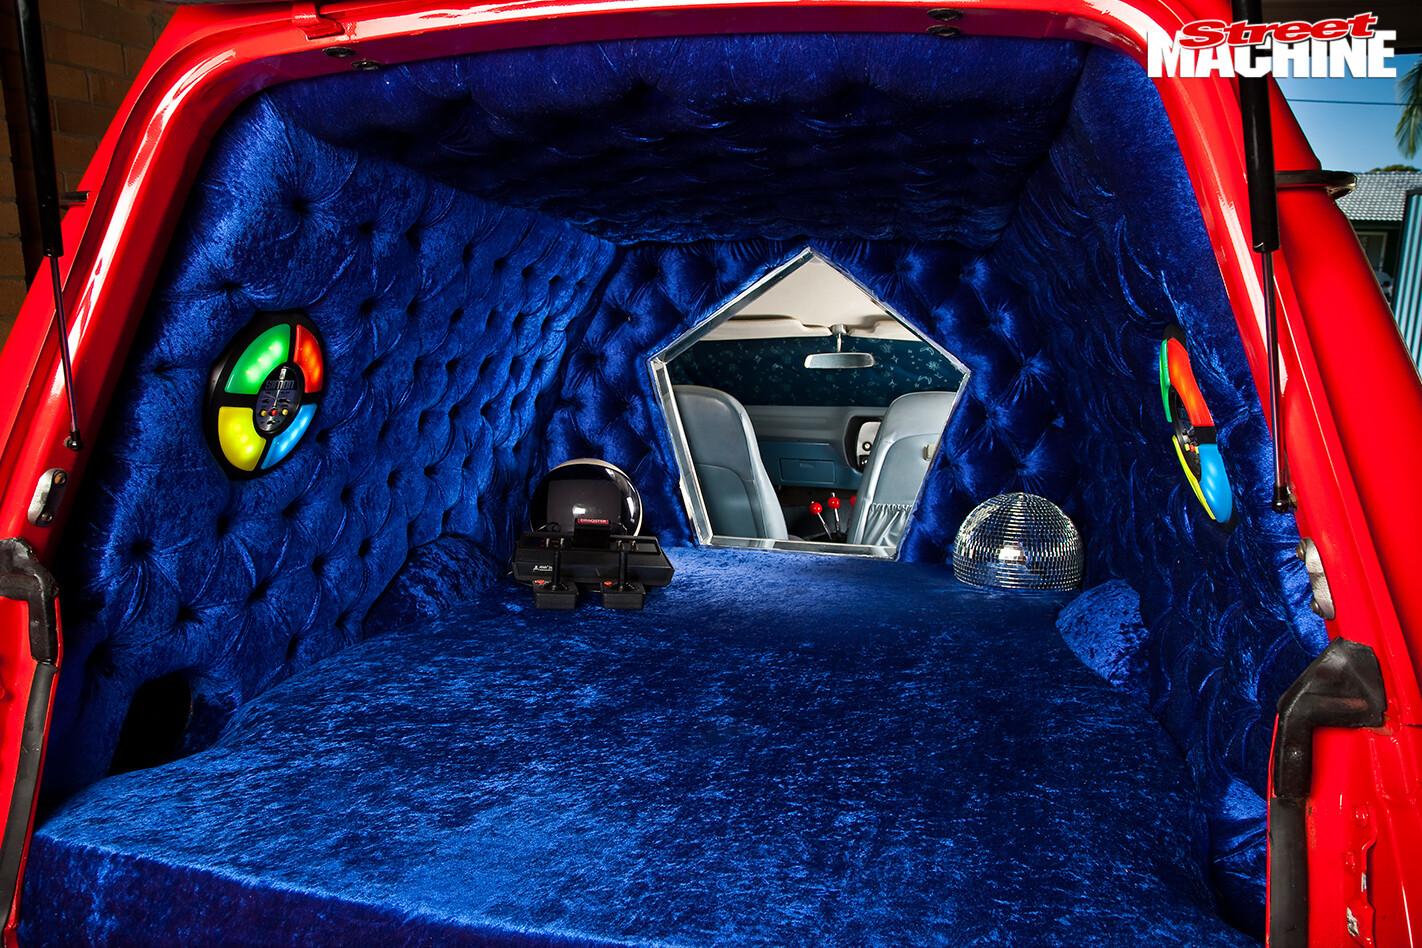 Chrysler -panel -van -interior -rear